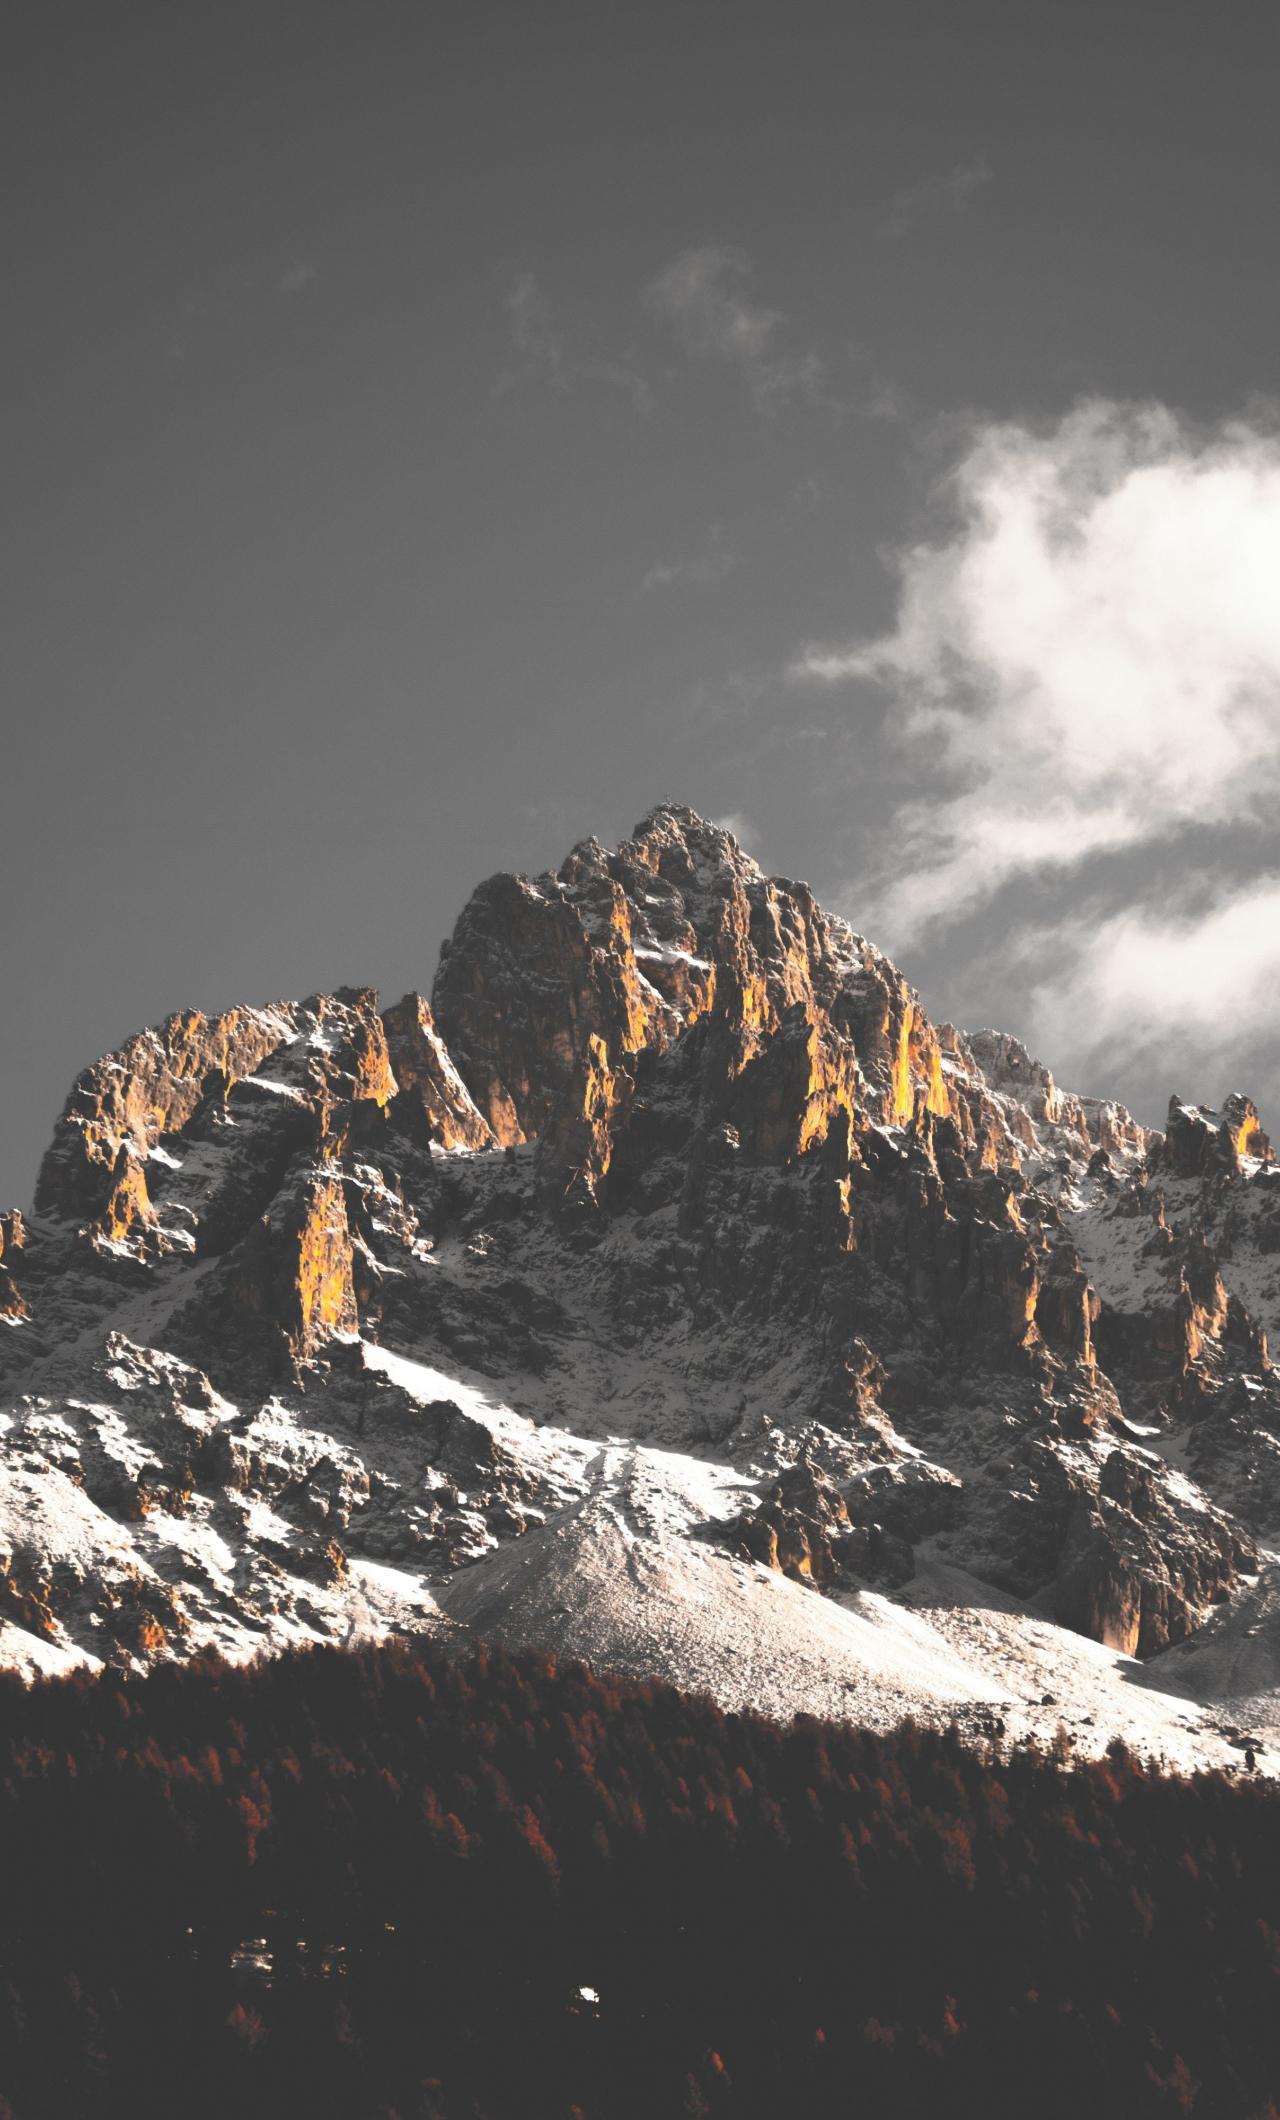 Mountain cliffs, nature, sky, clouds, tree, 1280x2120 wallpaper